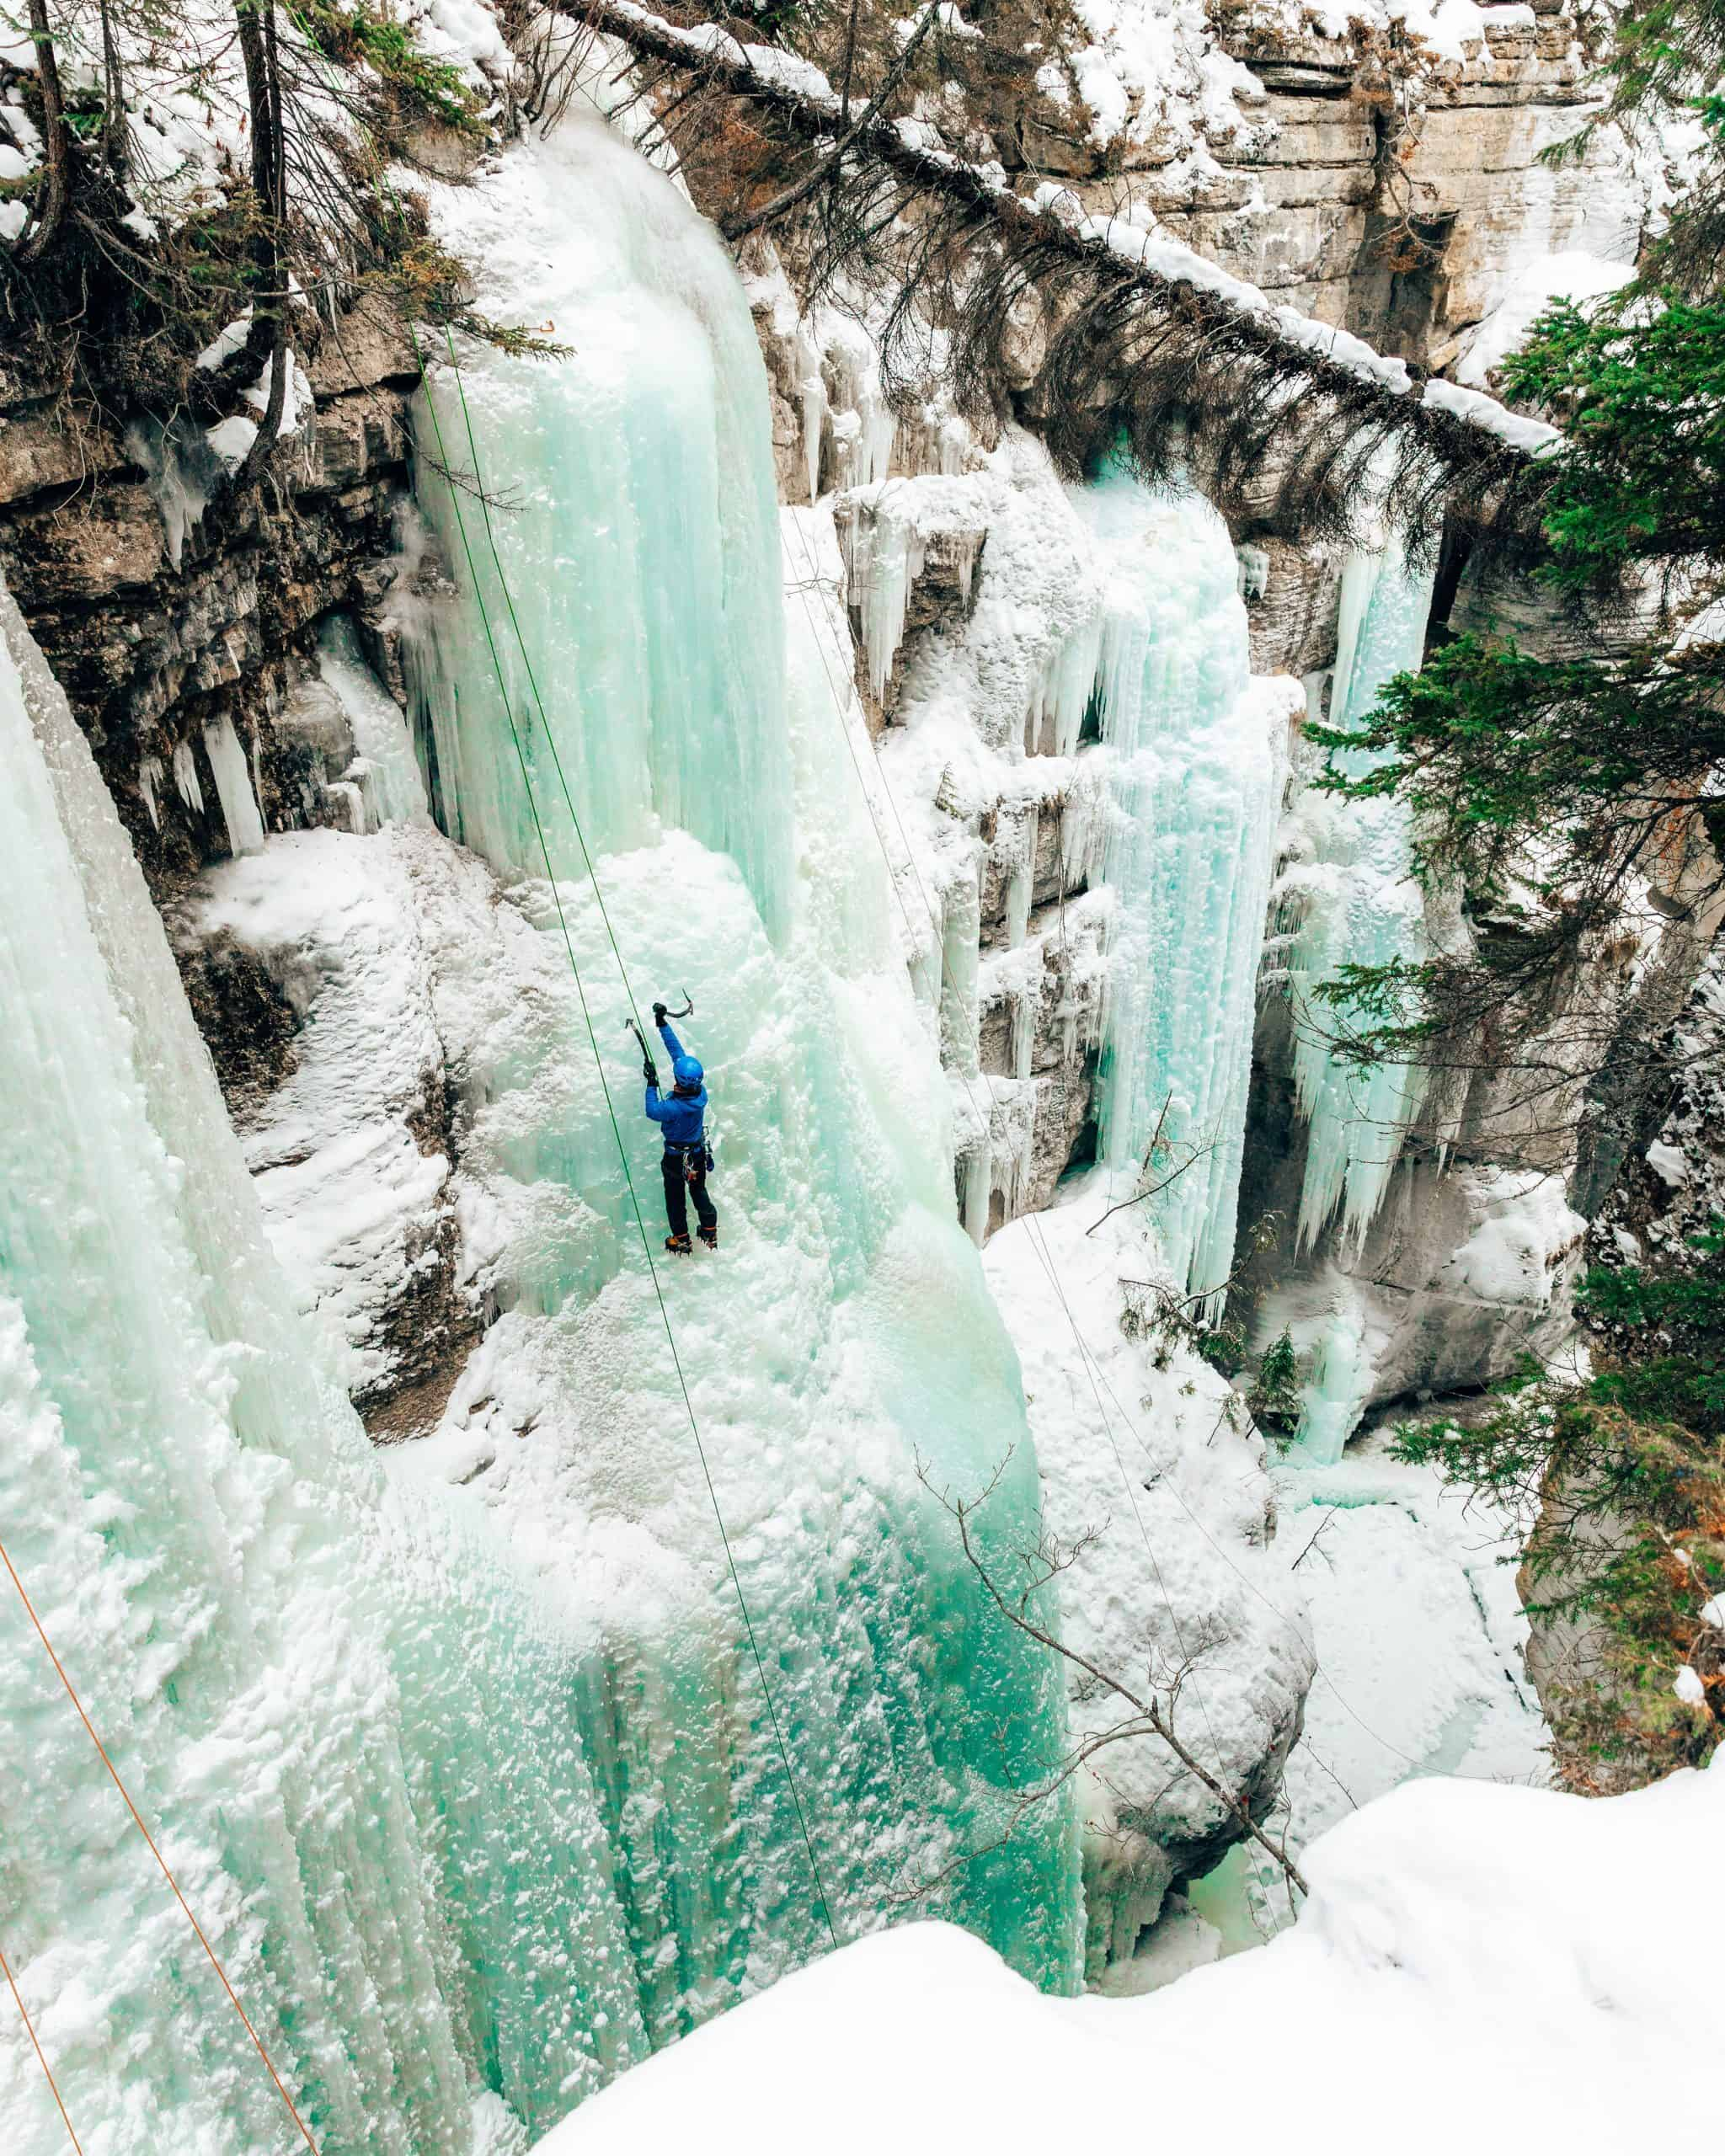 Ice Climber climbing up Frozen Waterfall at Maligne Canyon Jasper in Winter